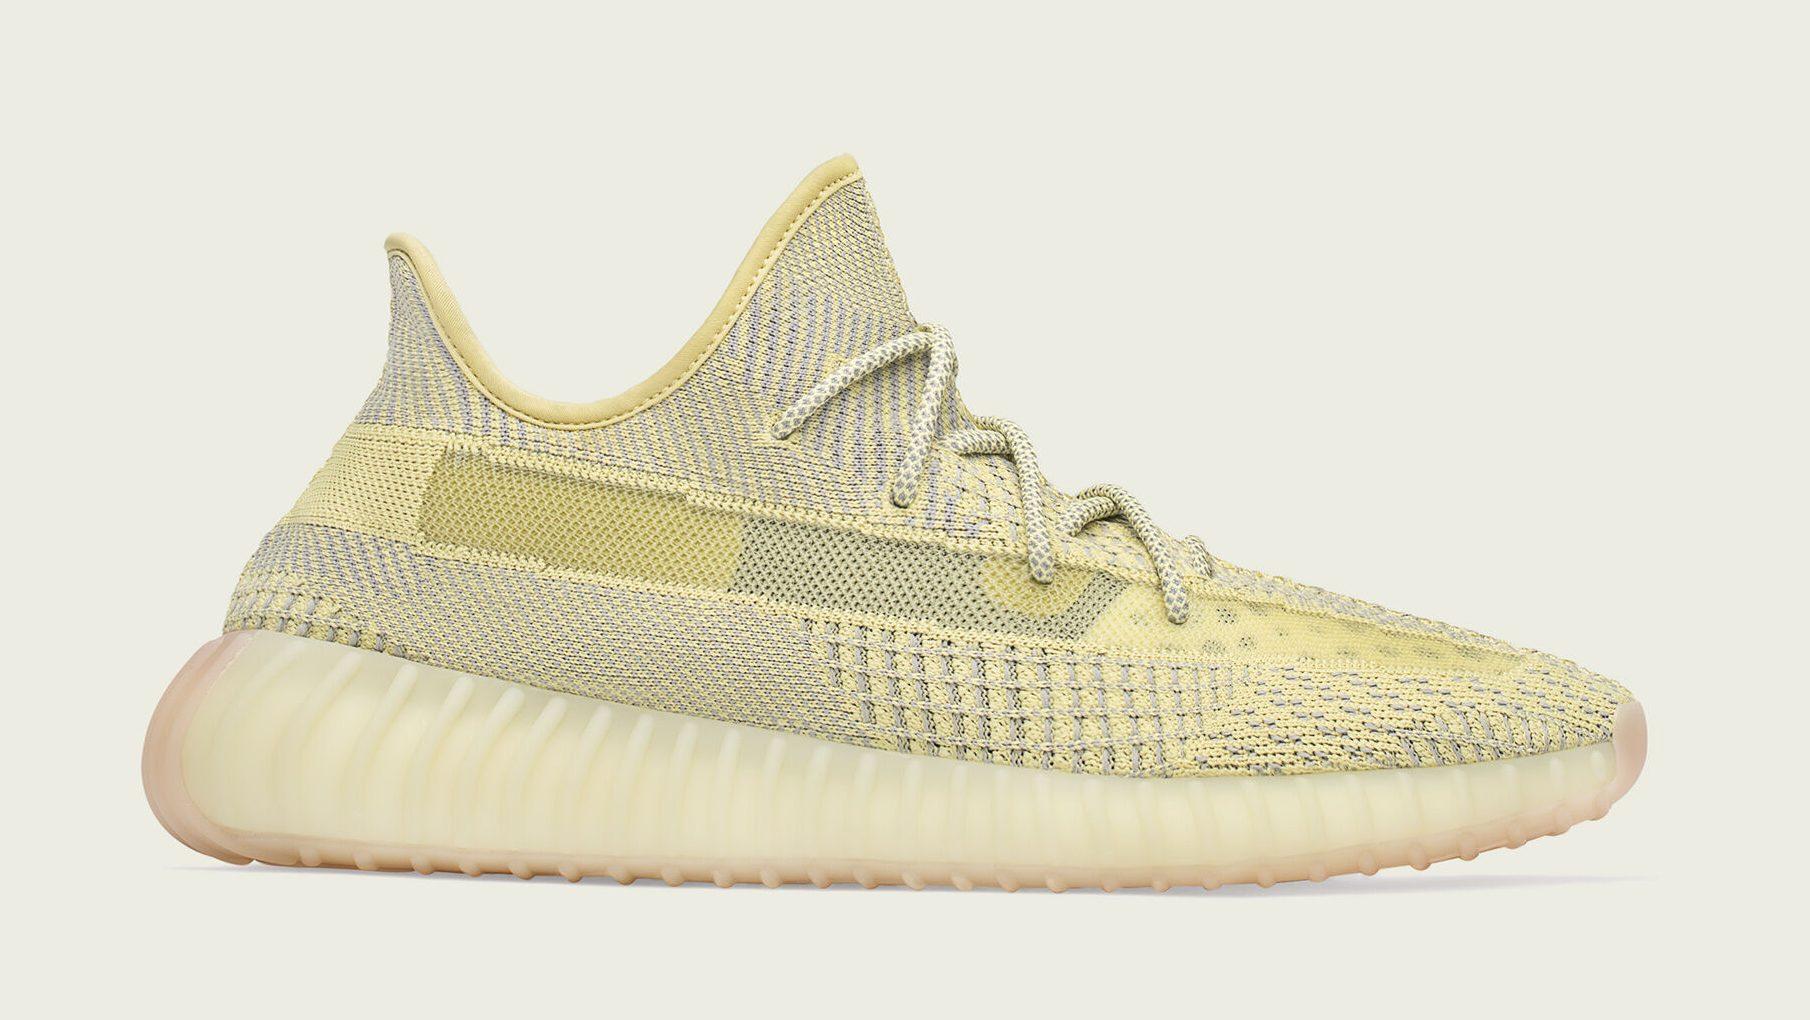 yeezy shoes 2019